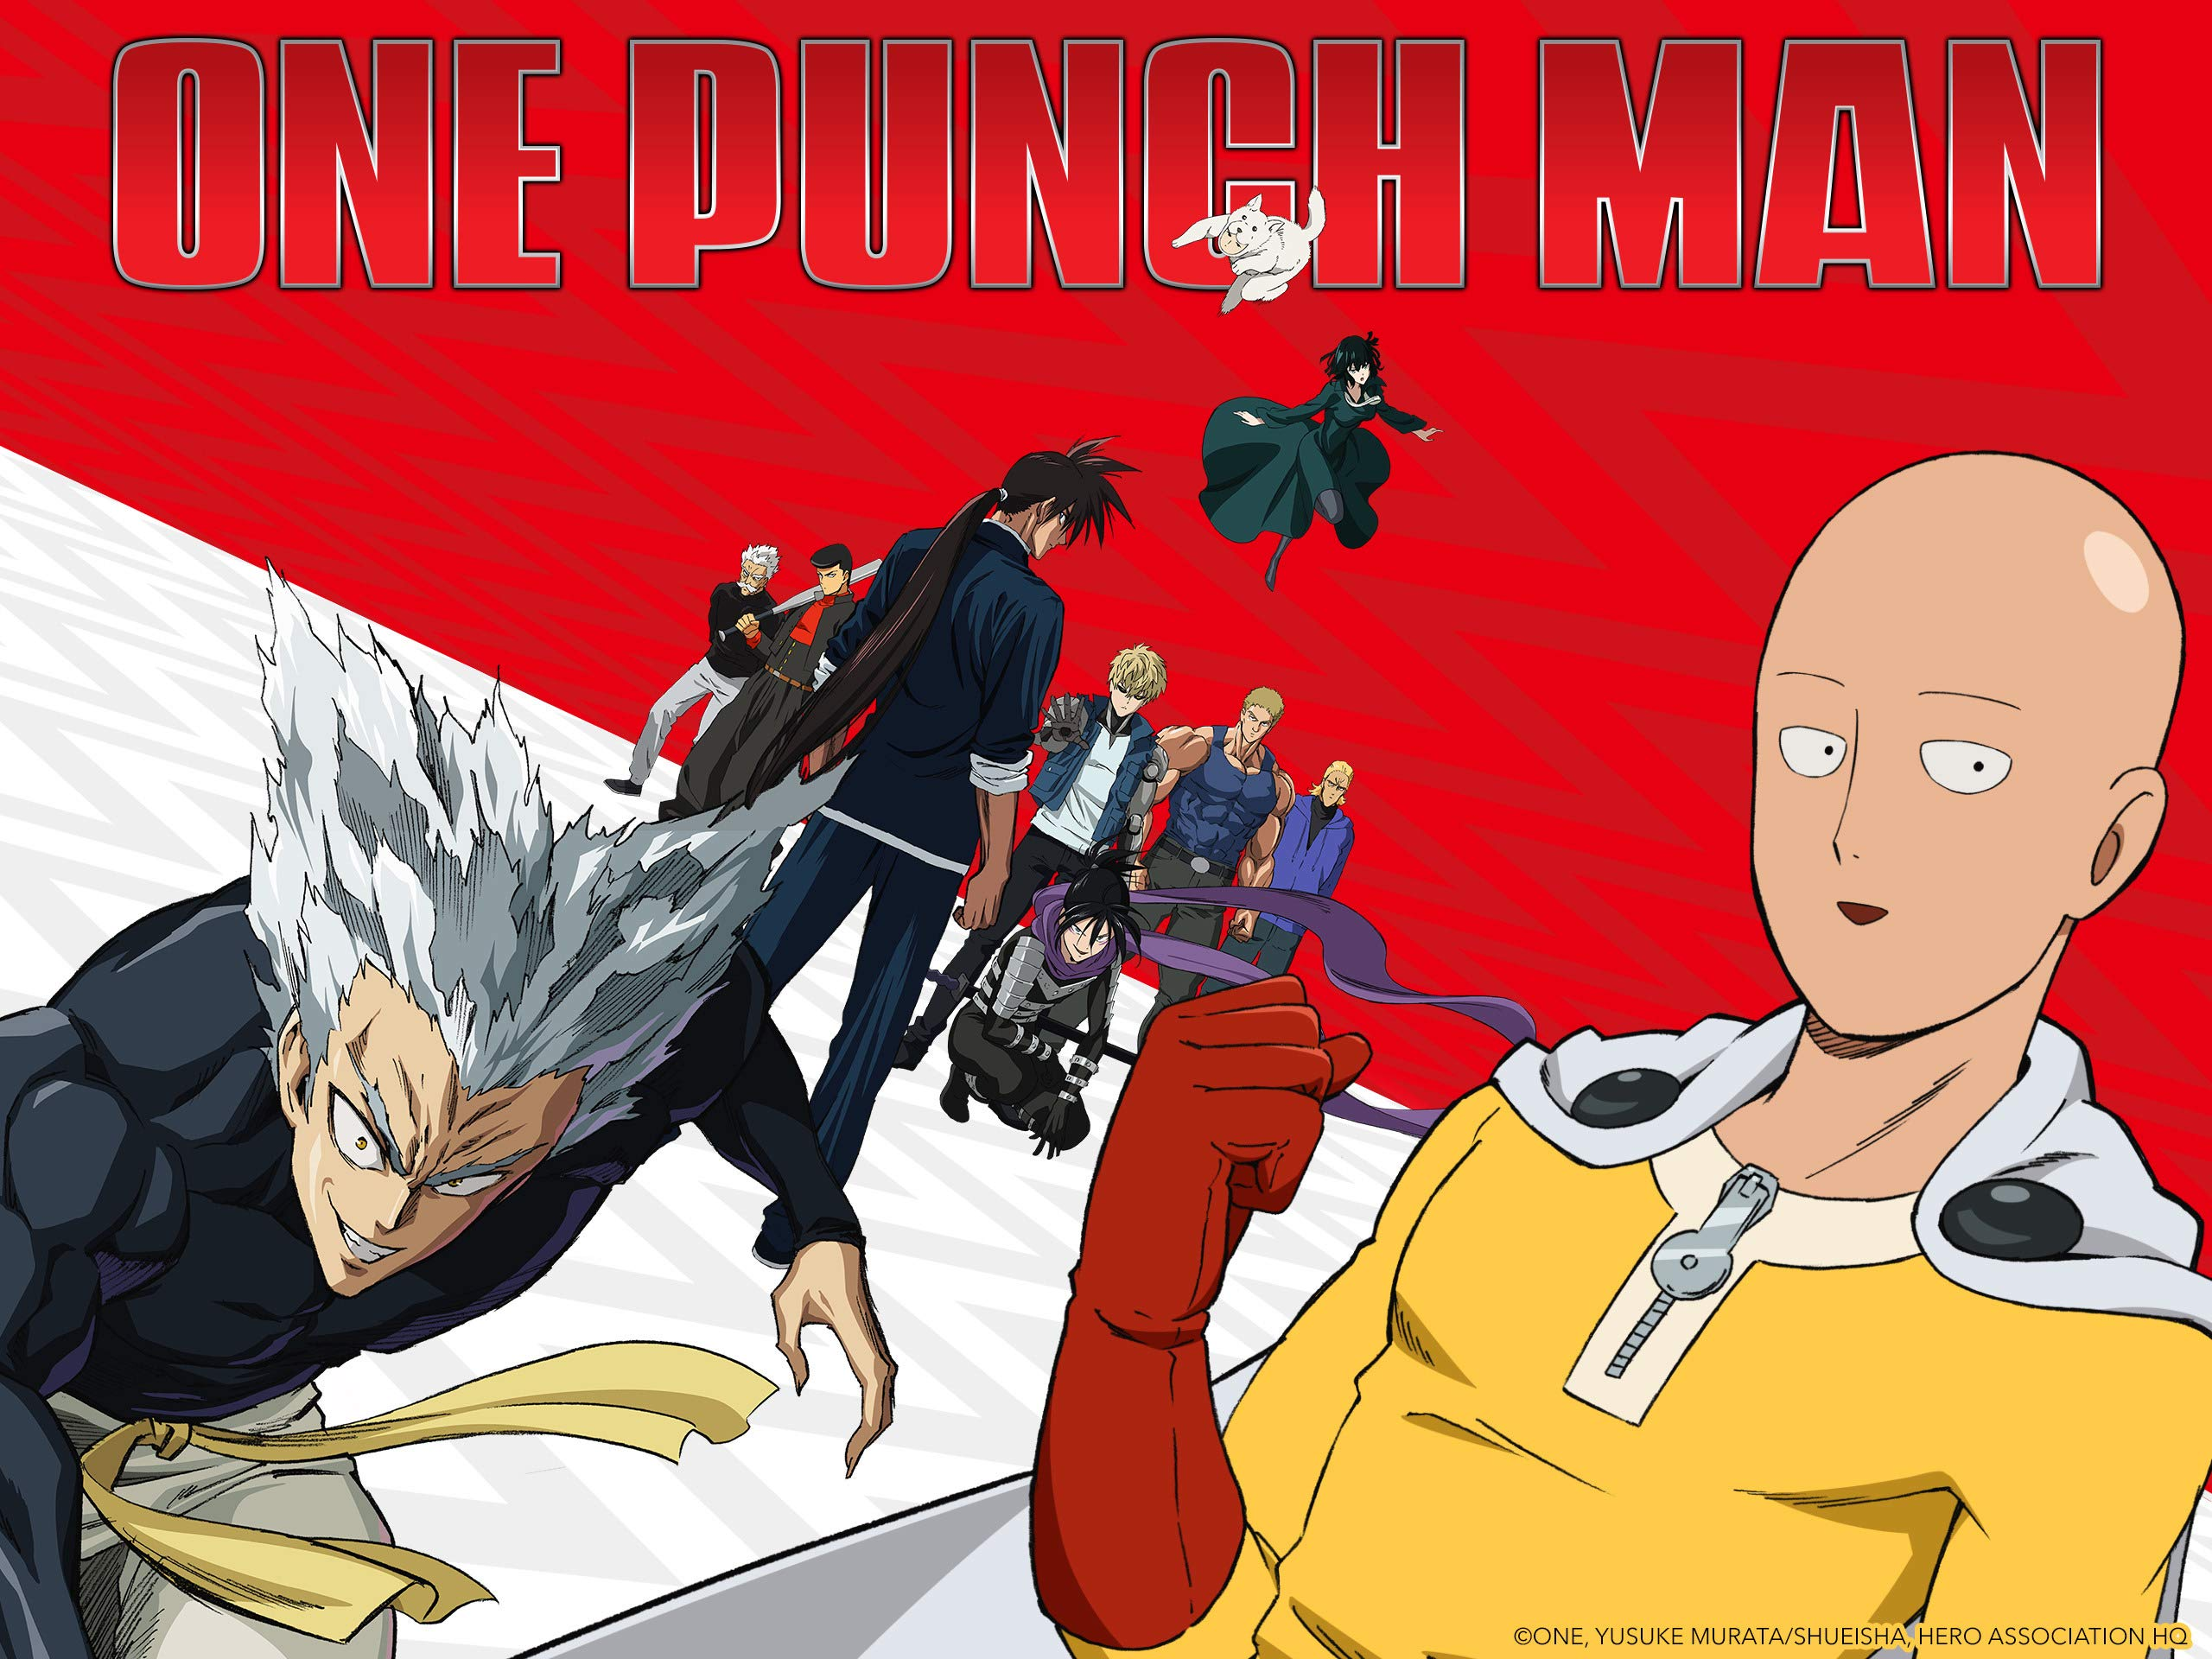 Dub english 1 man season 2 punch episode One Punch